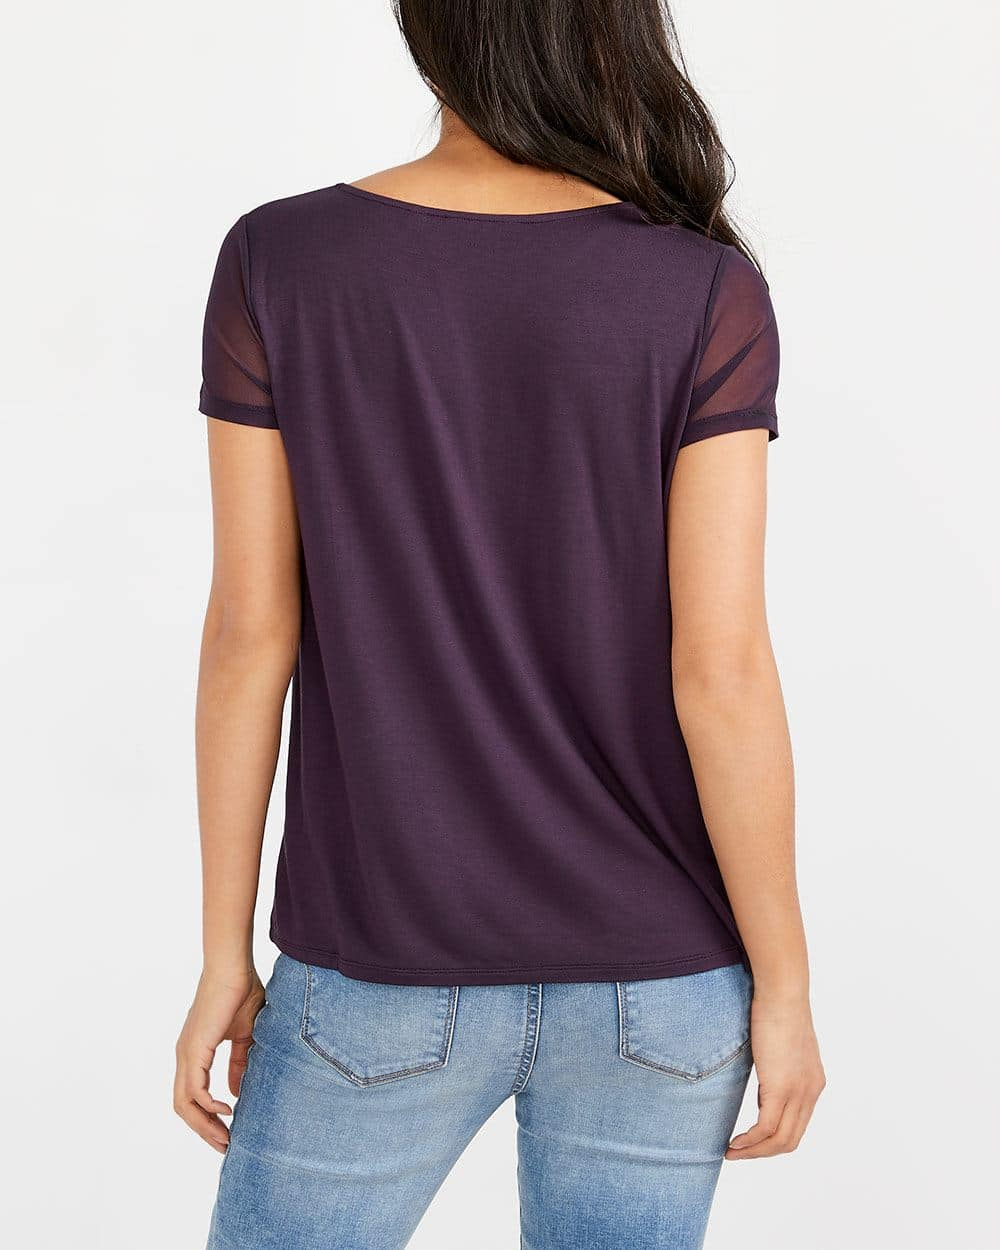 Mesh Yoke Solid T-Shirt